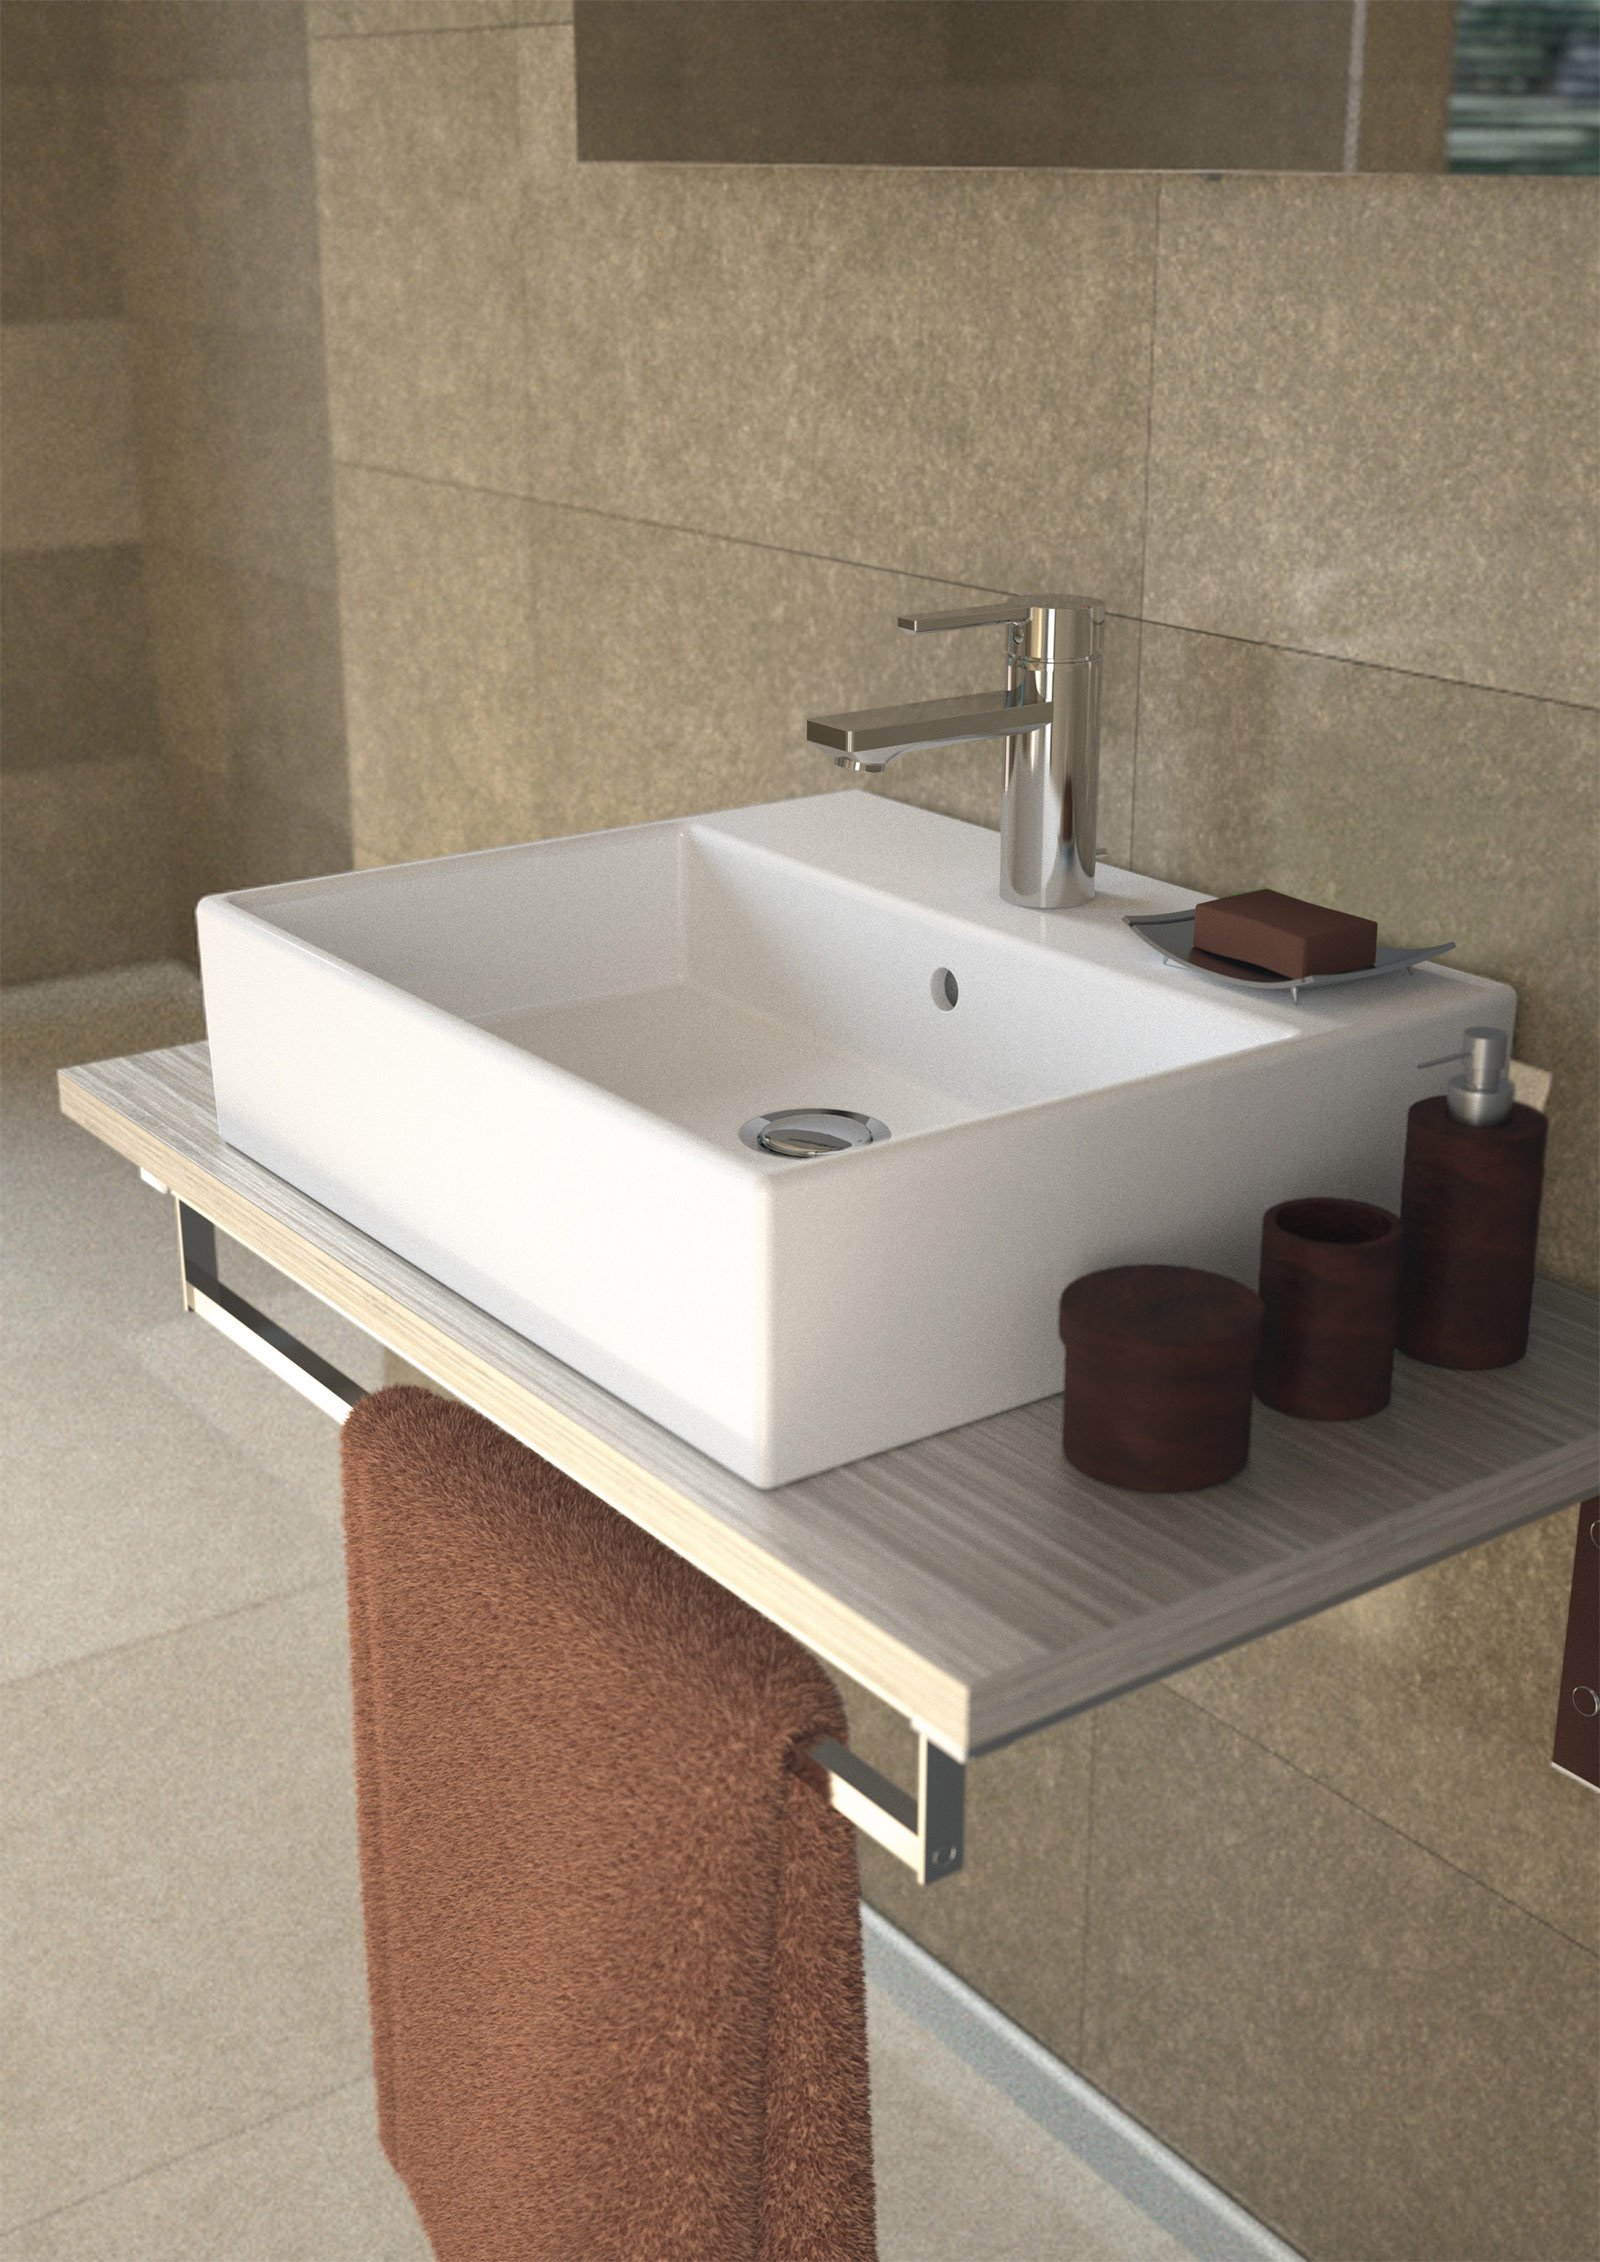 Lavelli per bagno in muratura : lavabi per bagno in muratura ...